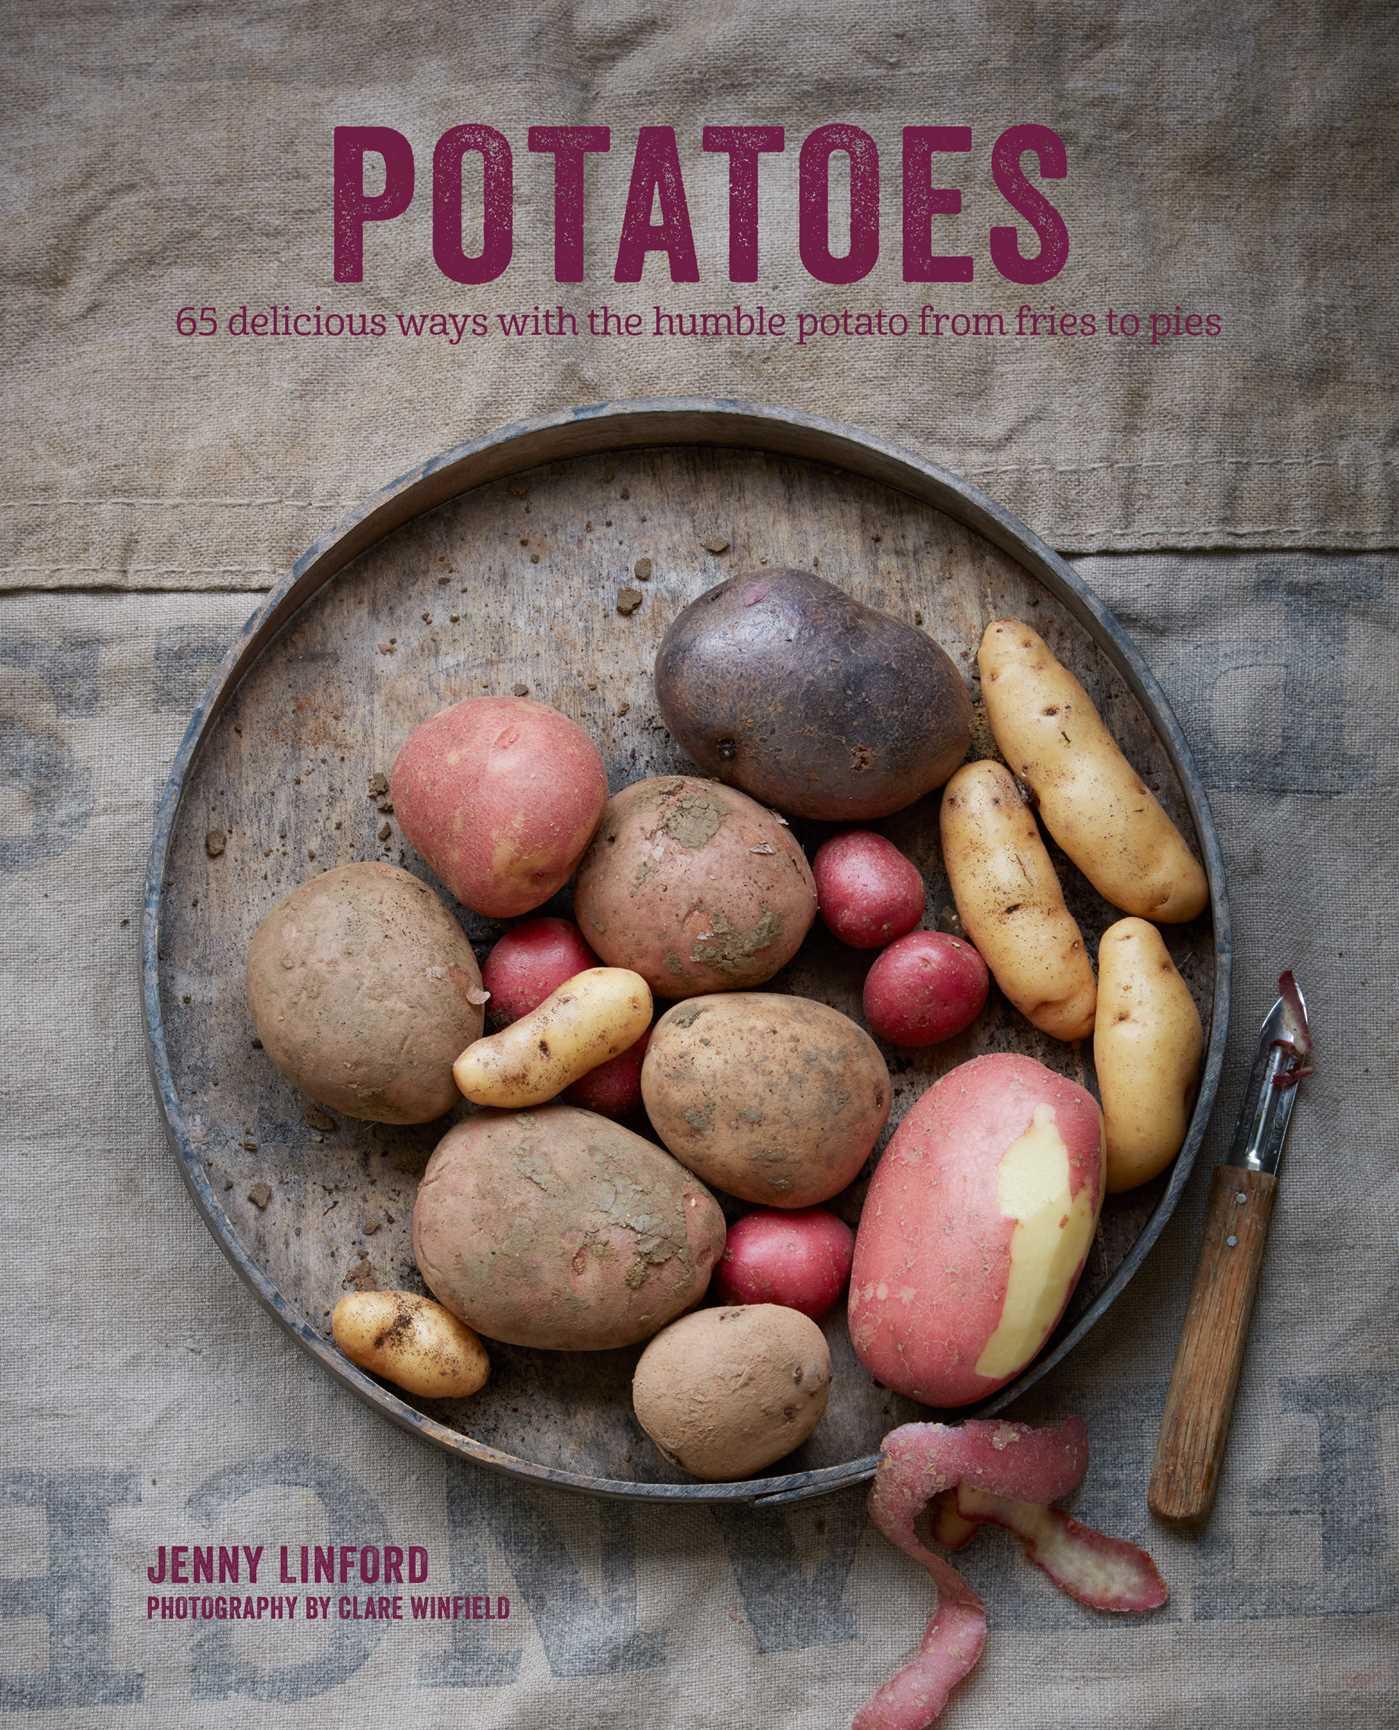 Potatoes 9781788790284 hr